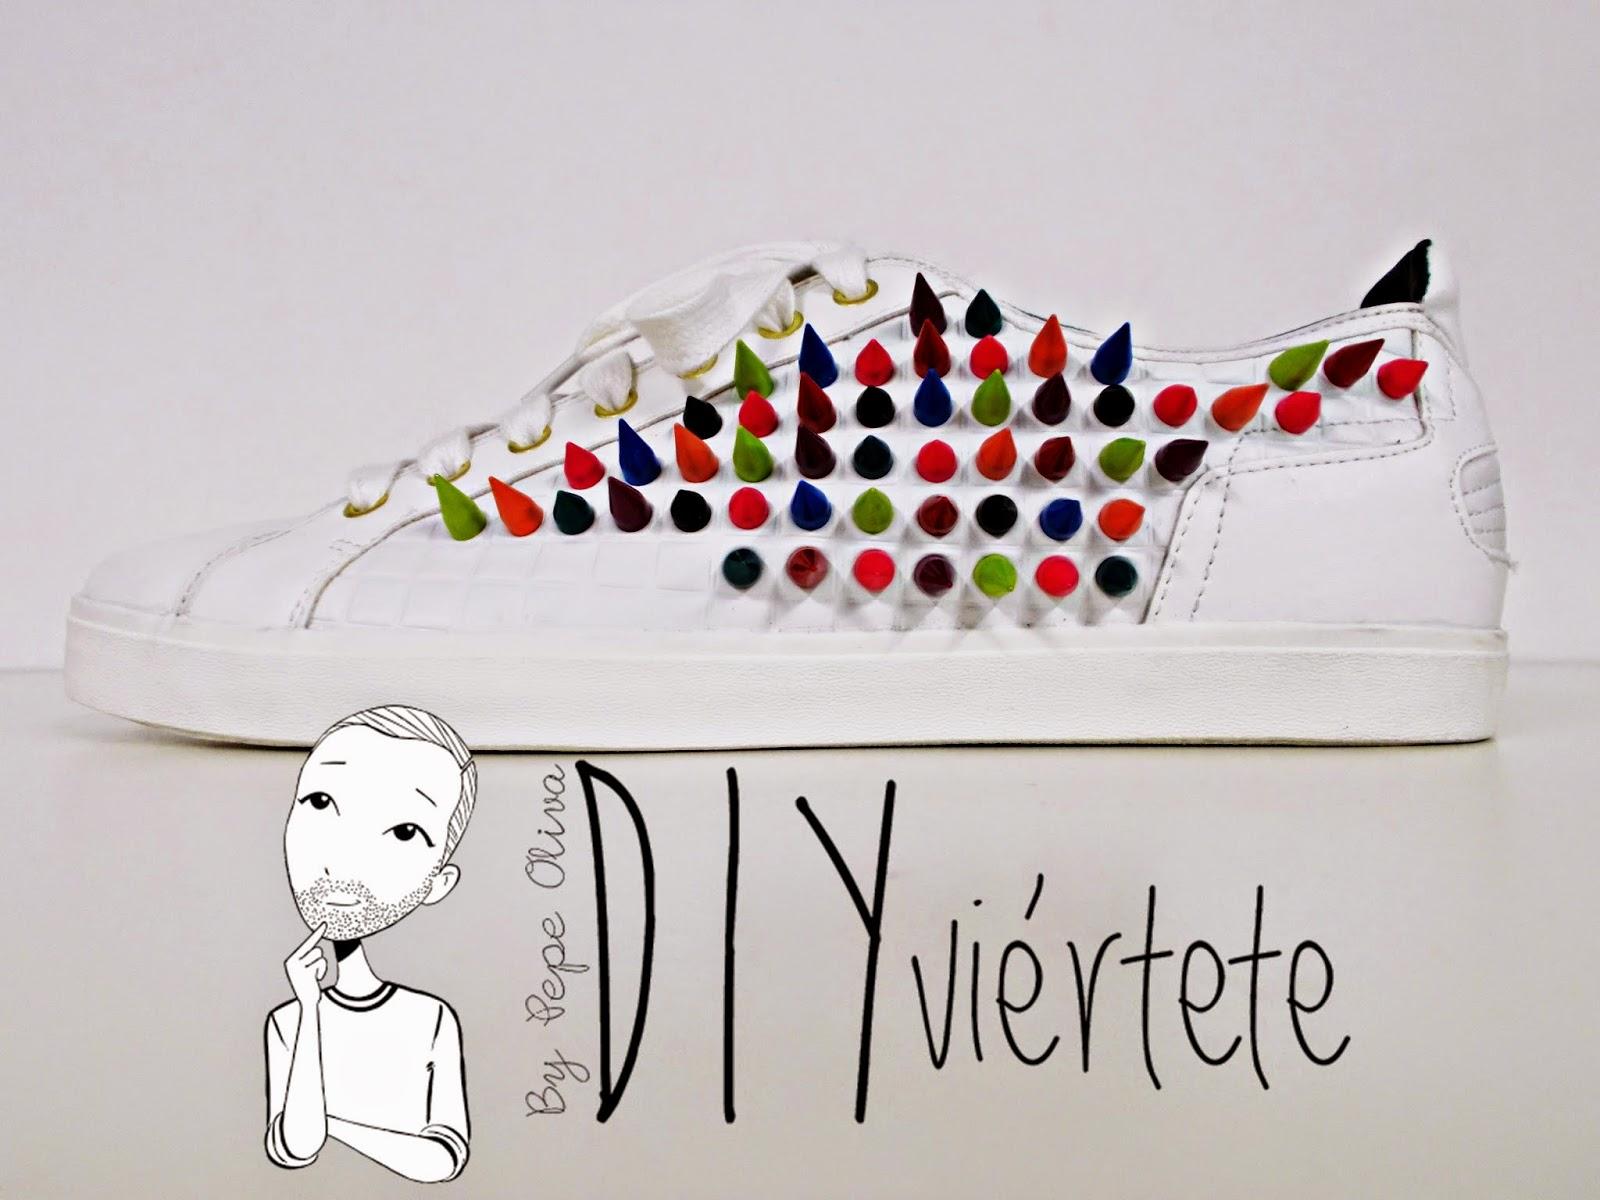 DIY-zapatillas-tunear-customizar-CHRISTIAN-LOUBOUTIN-zapatos-pinchos-esmaltes-pinta uñas-colores-15